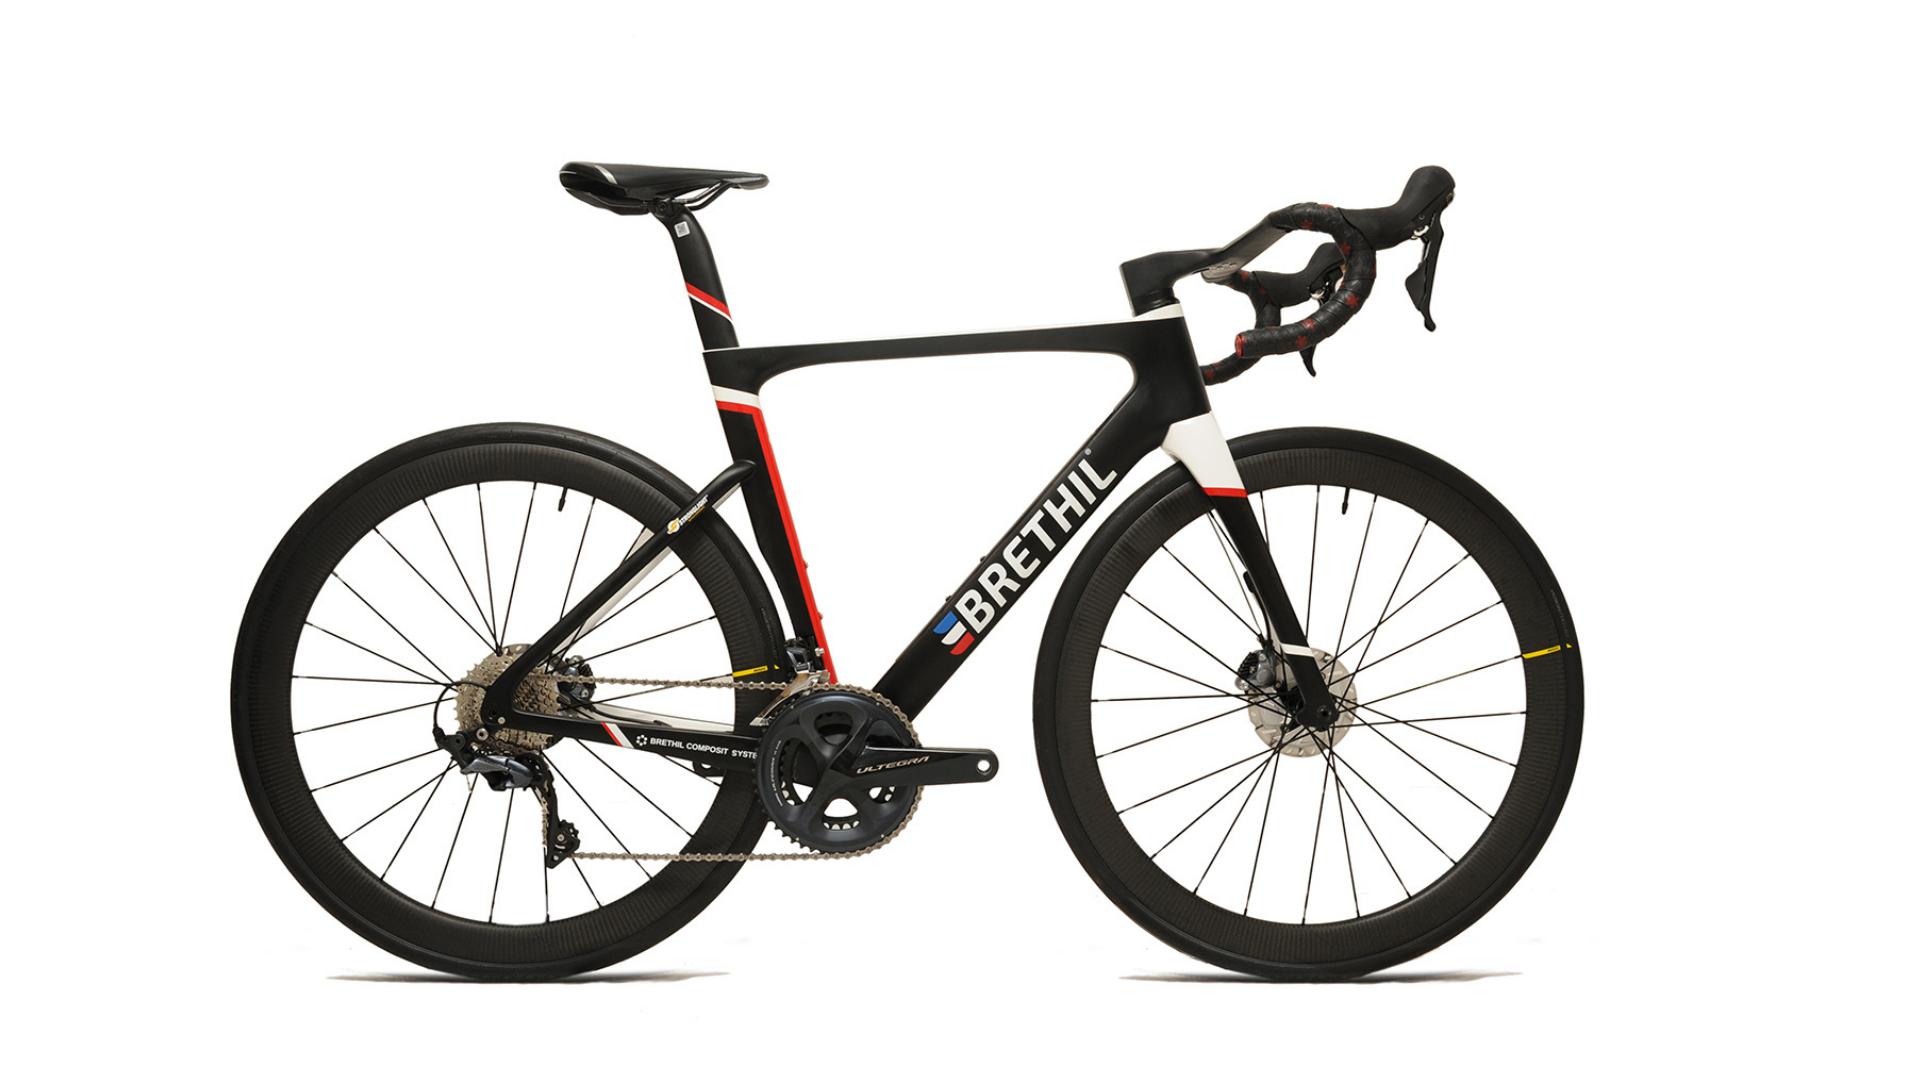 Brethil Baltic Racing Bike